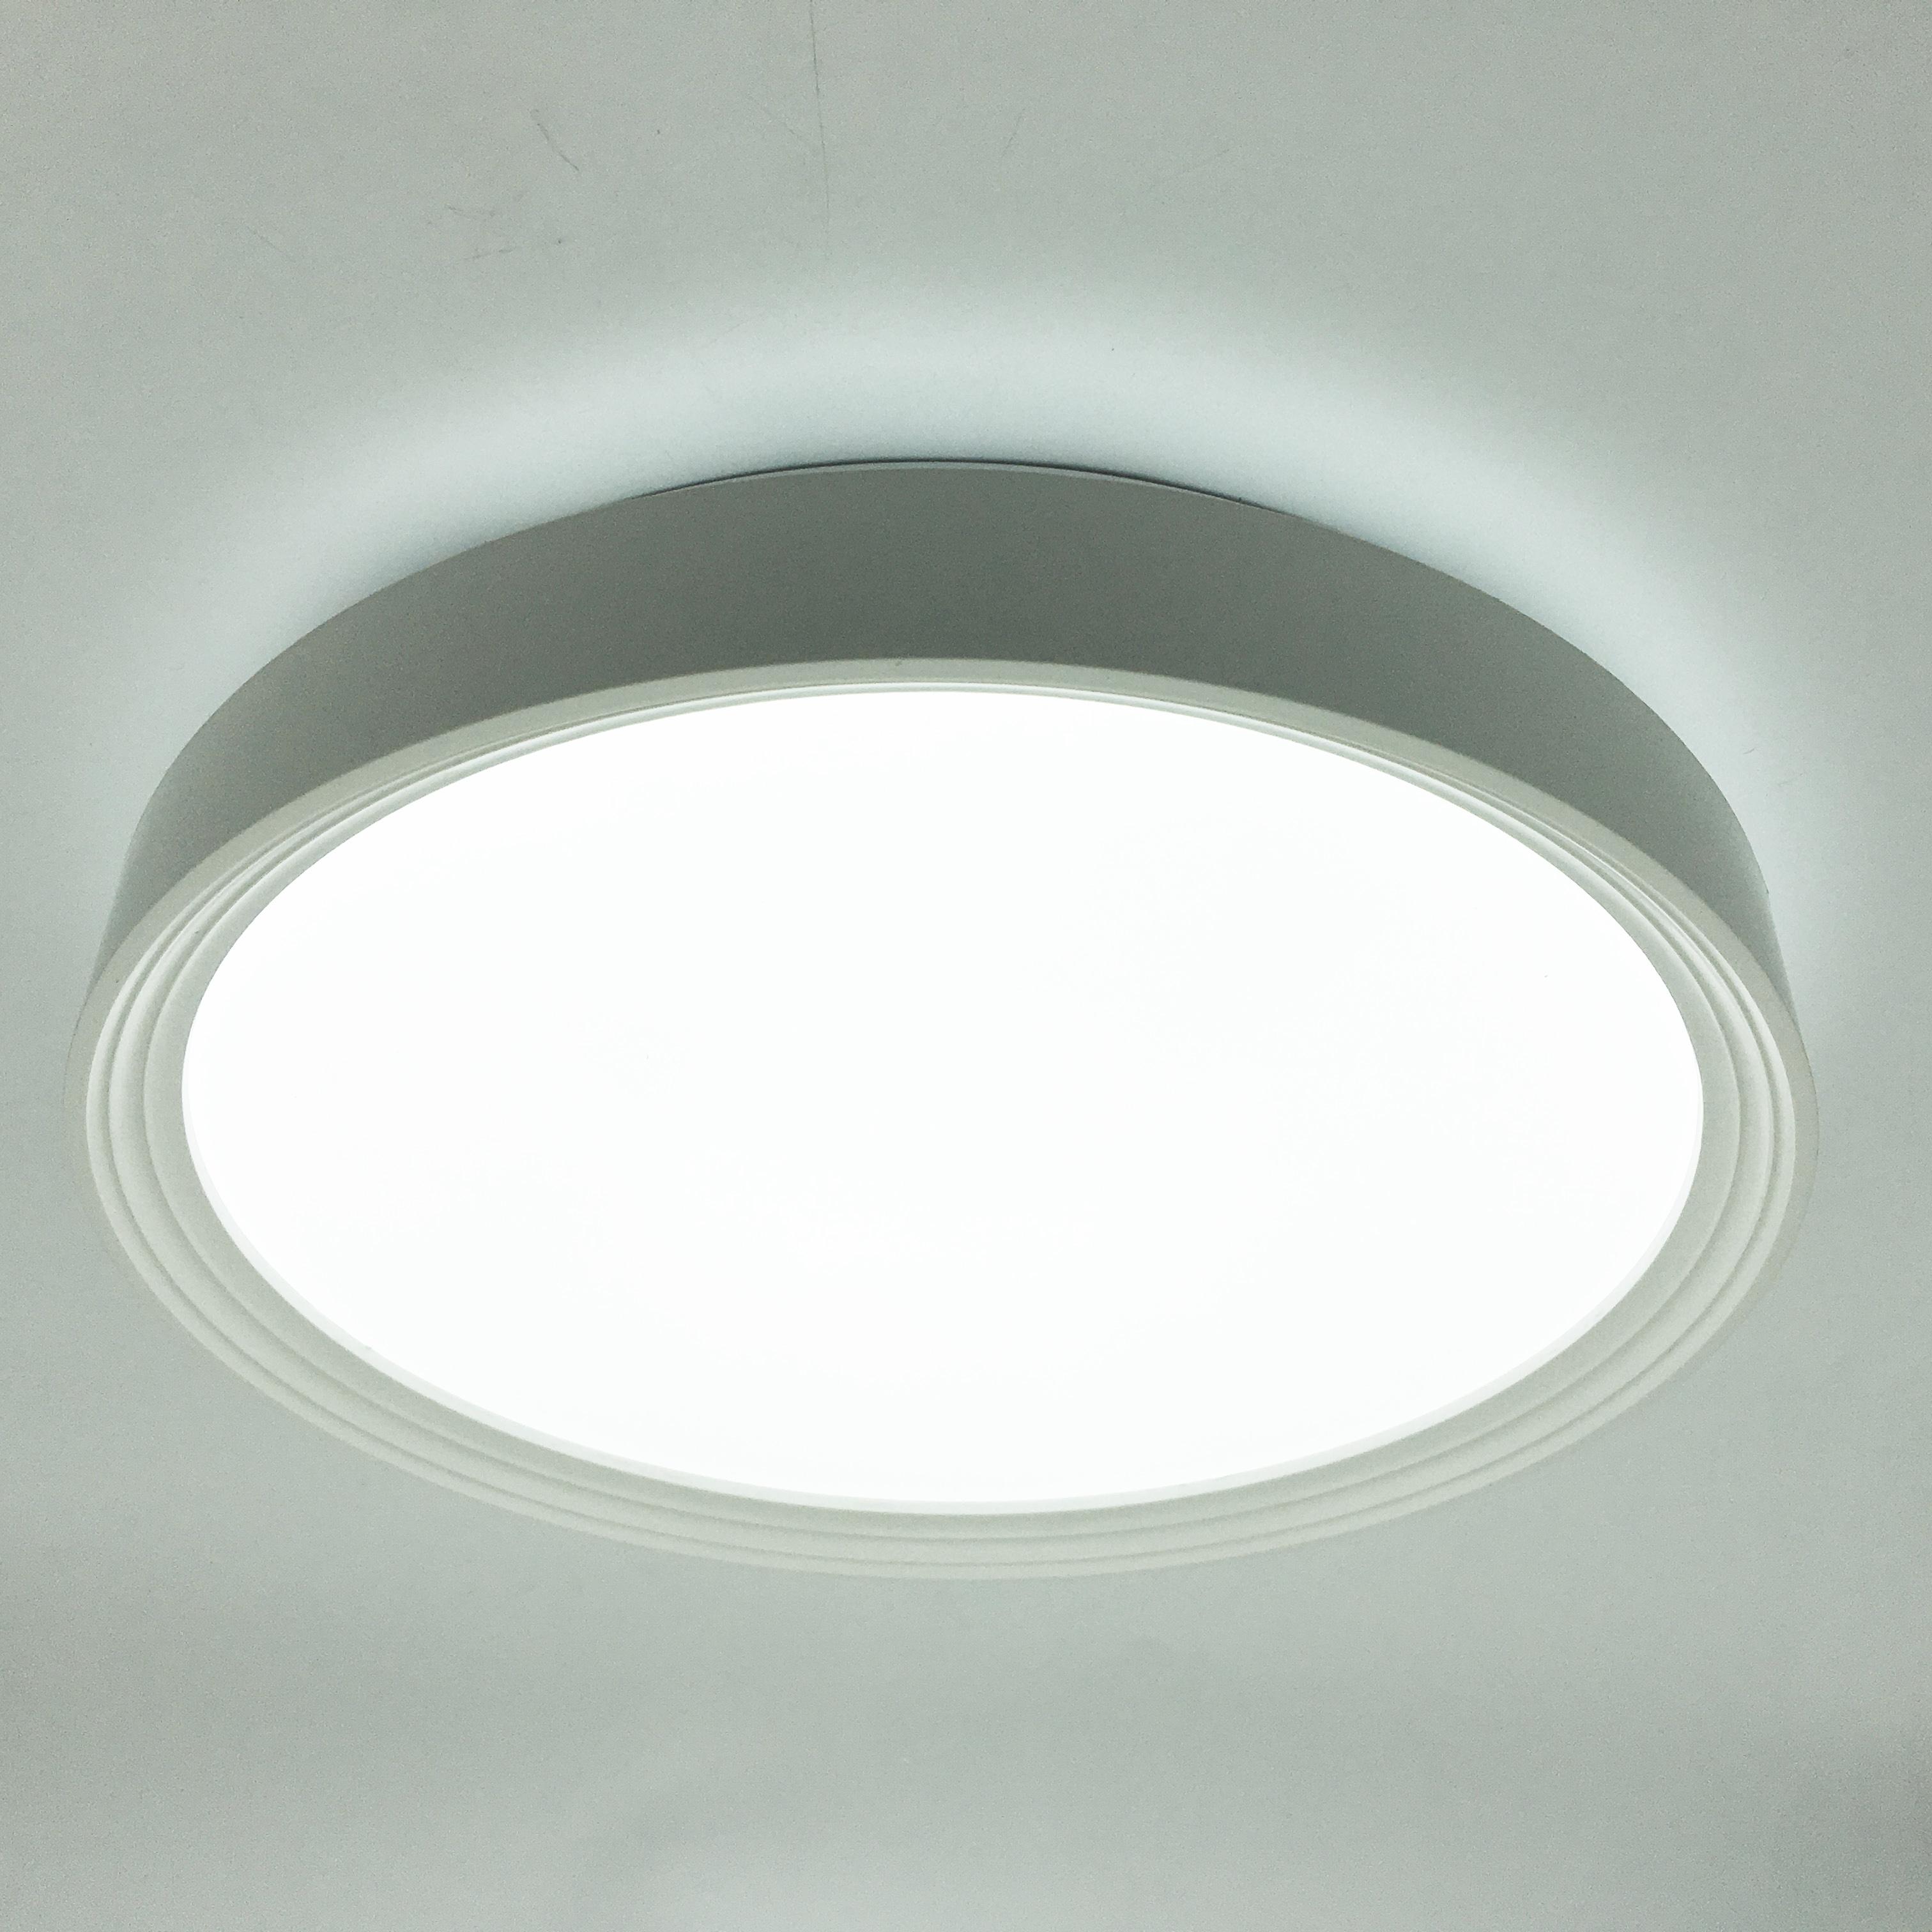 House Balcony Elevator Motion Sensor Circular Plafon Ceiling Light Led Buy Led Ceiling Lamp Modern Dimmable Led Lamps 24w Led Lamps Round White Product On Alibaba Com